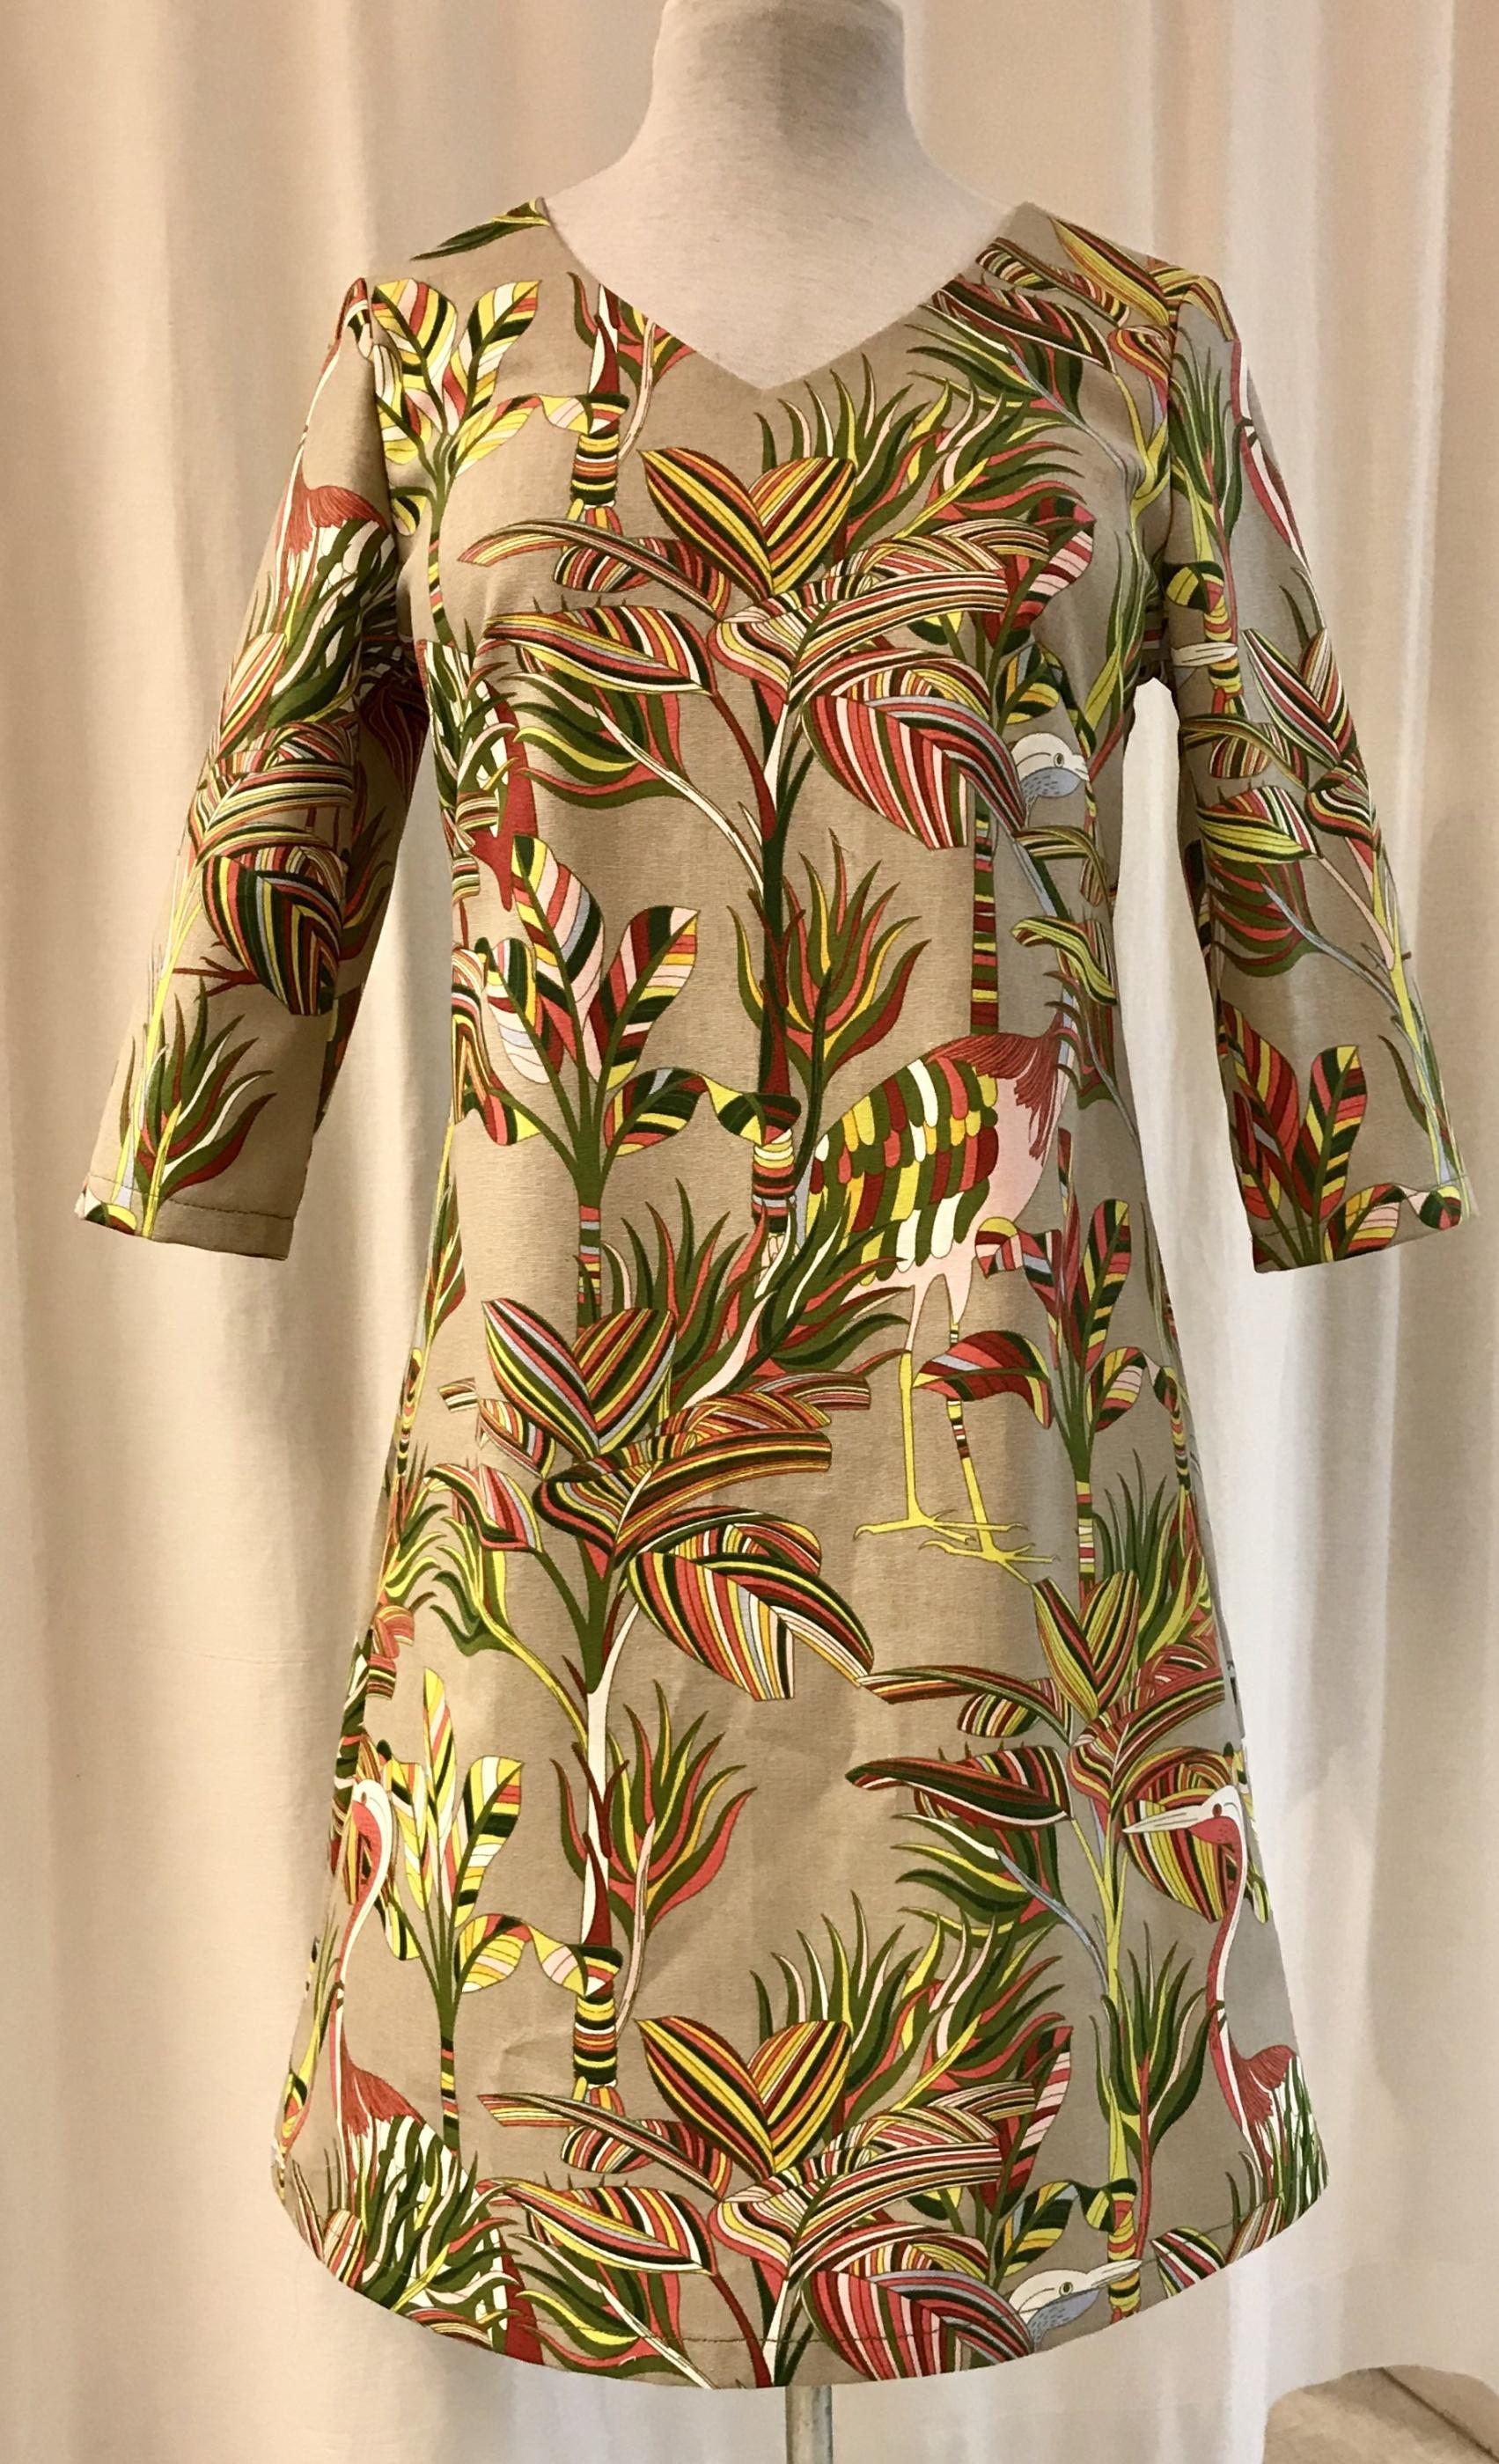 klänning solbritt SaraLaholm unik design djungel blad flamingo